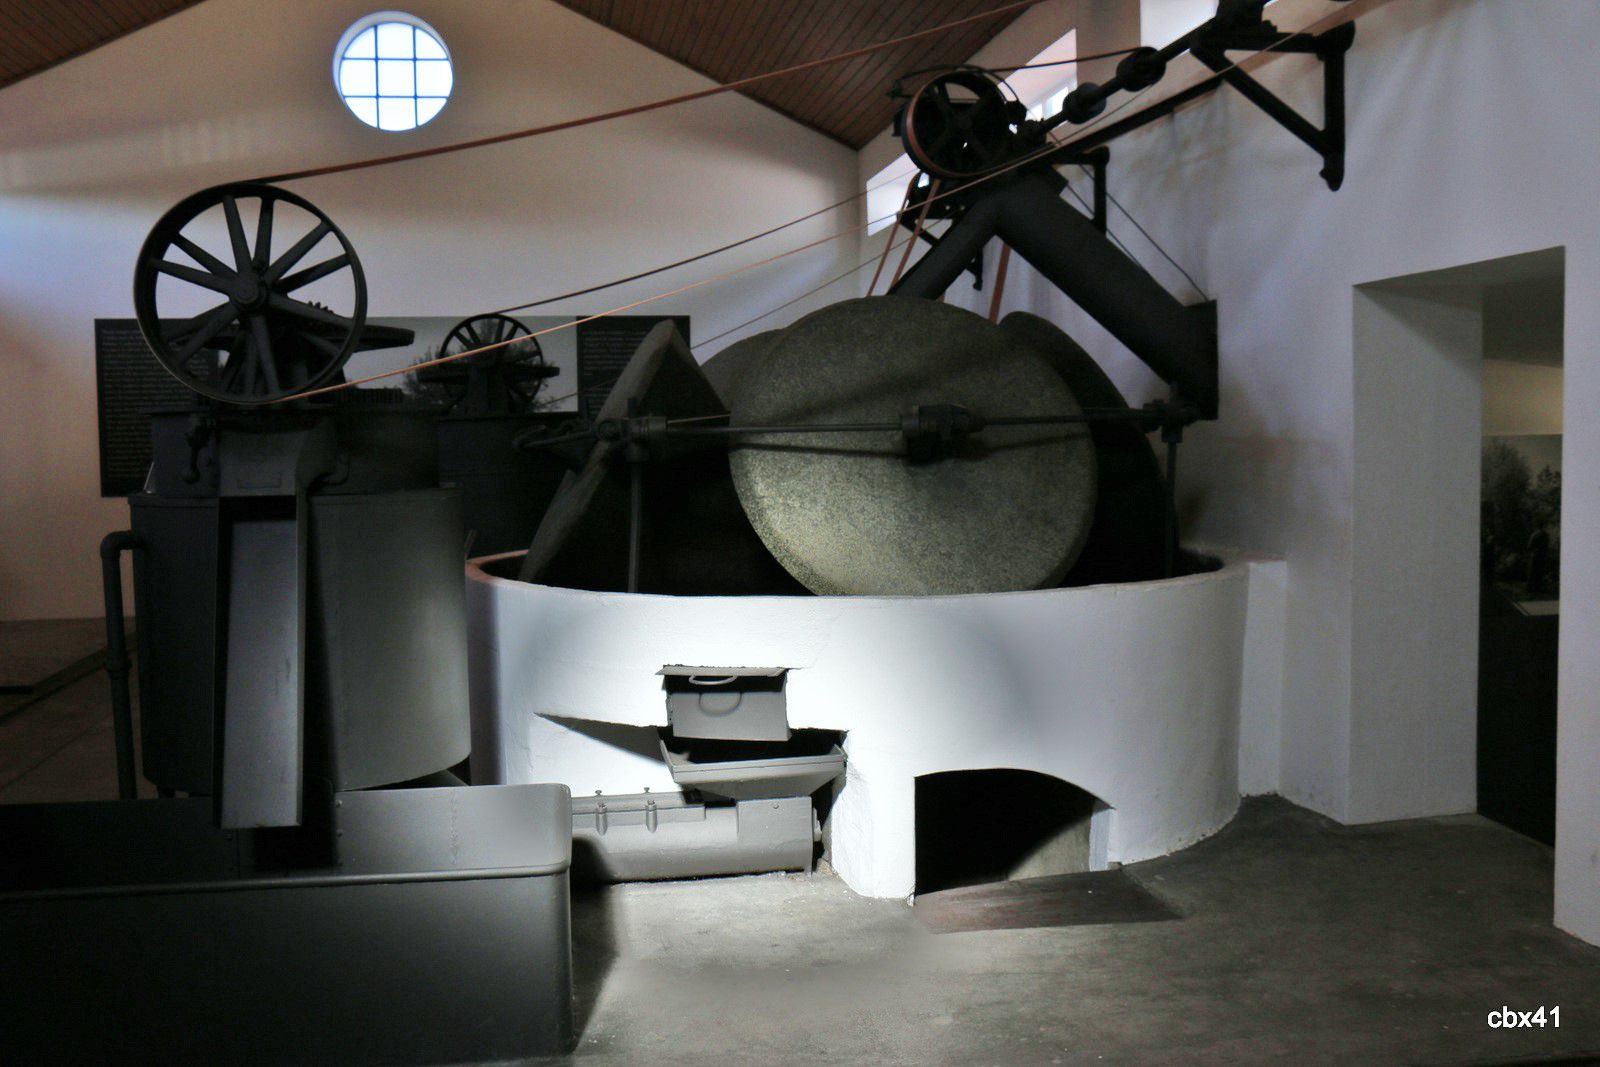 Musée de l'huile d'olive, Fátima